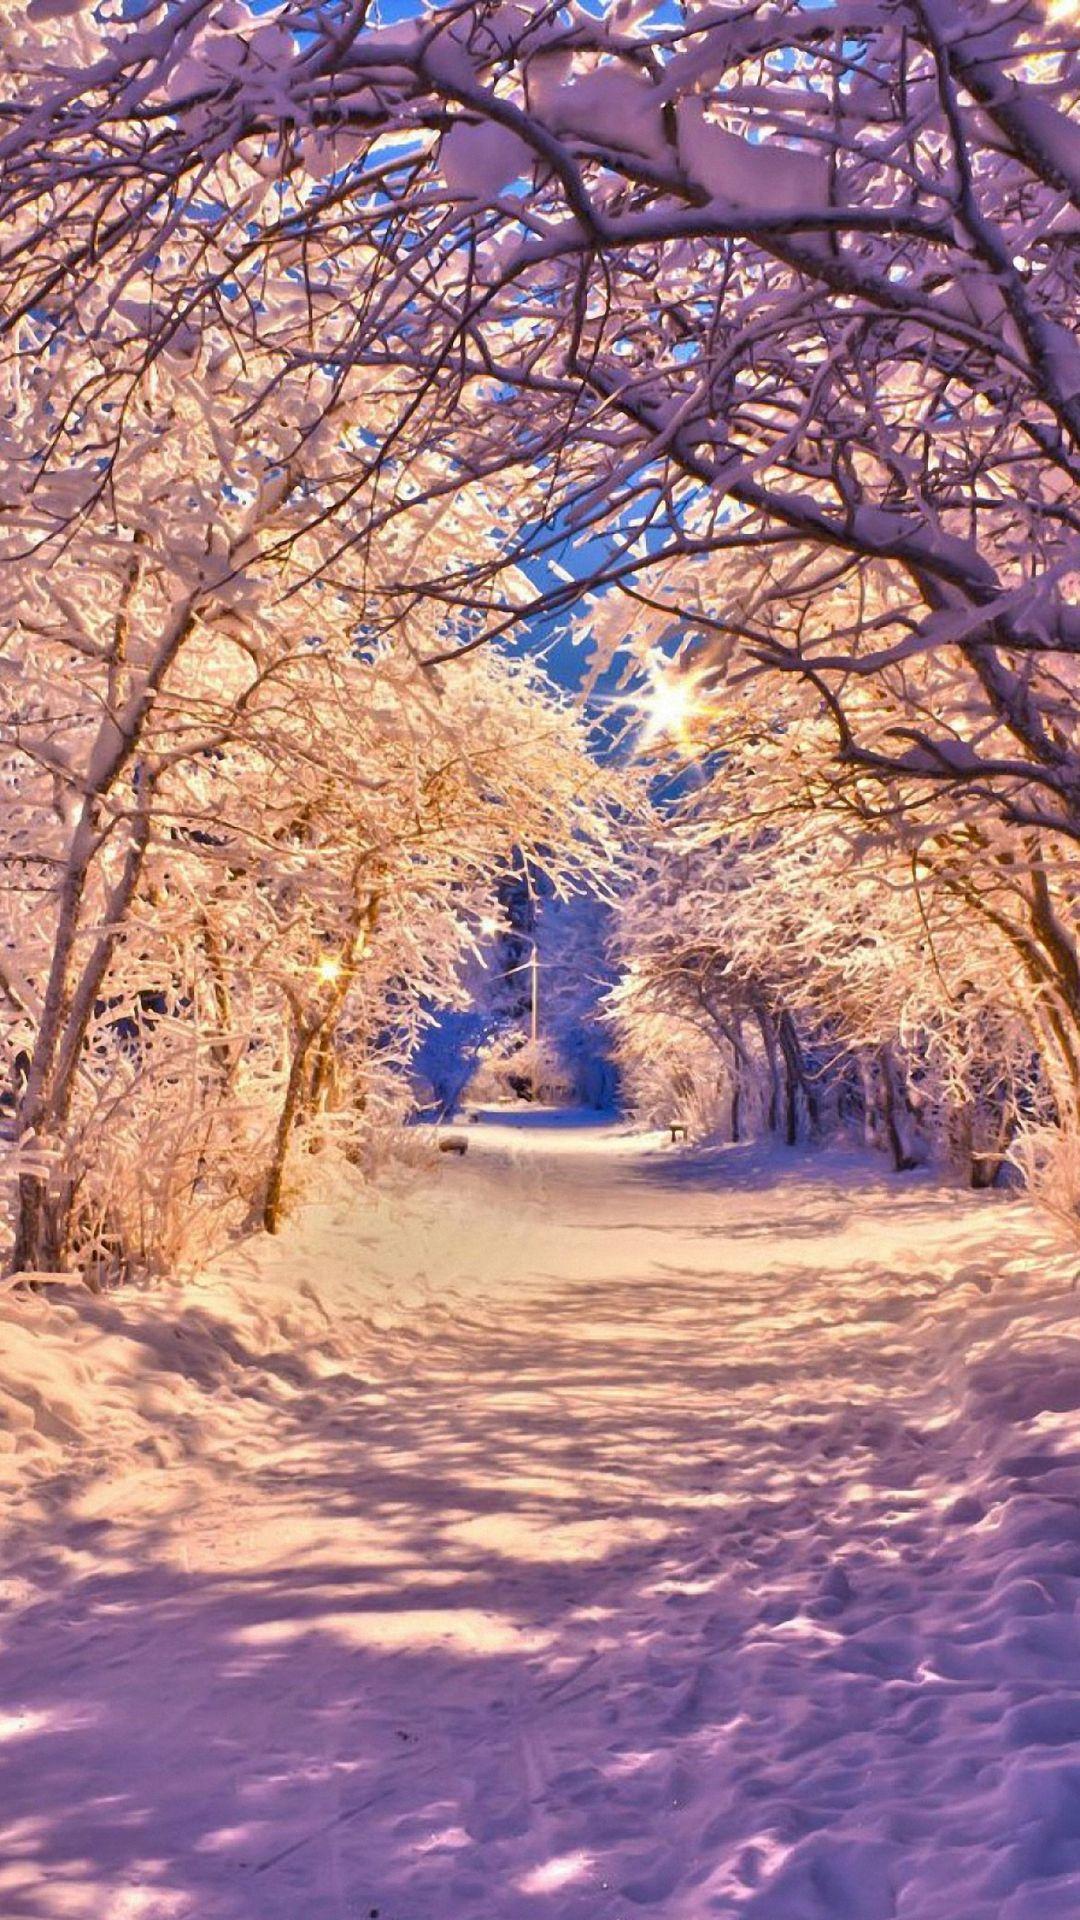 Winter iPhone Wallpapers - Wallpaper Cave